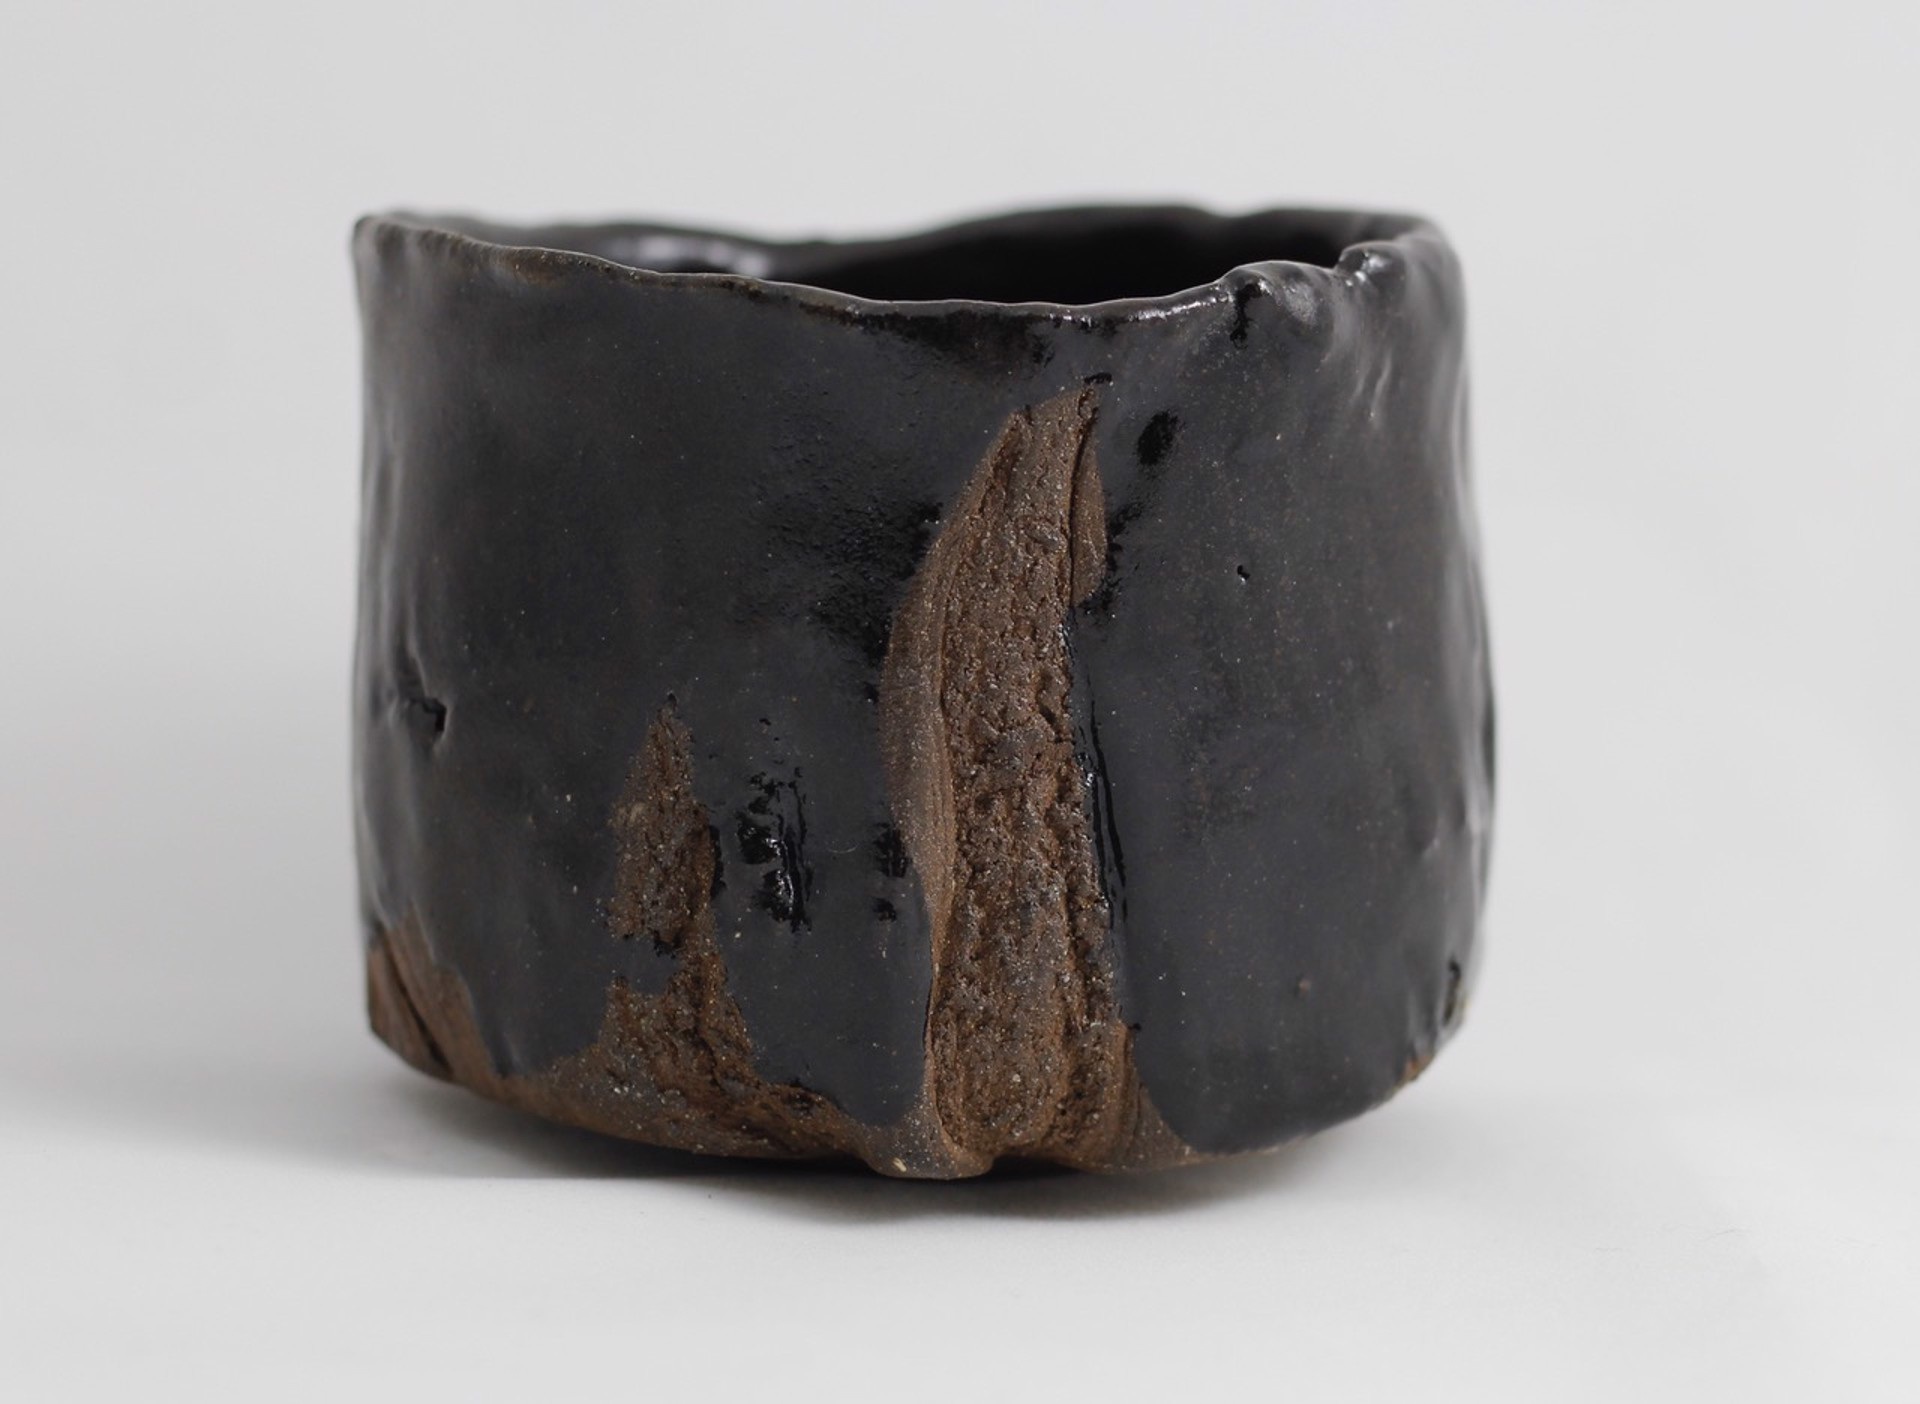 Setoguro Tea bowl by Kristin Müller